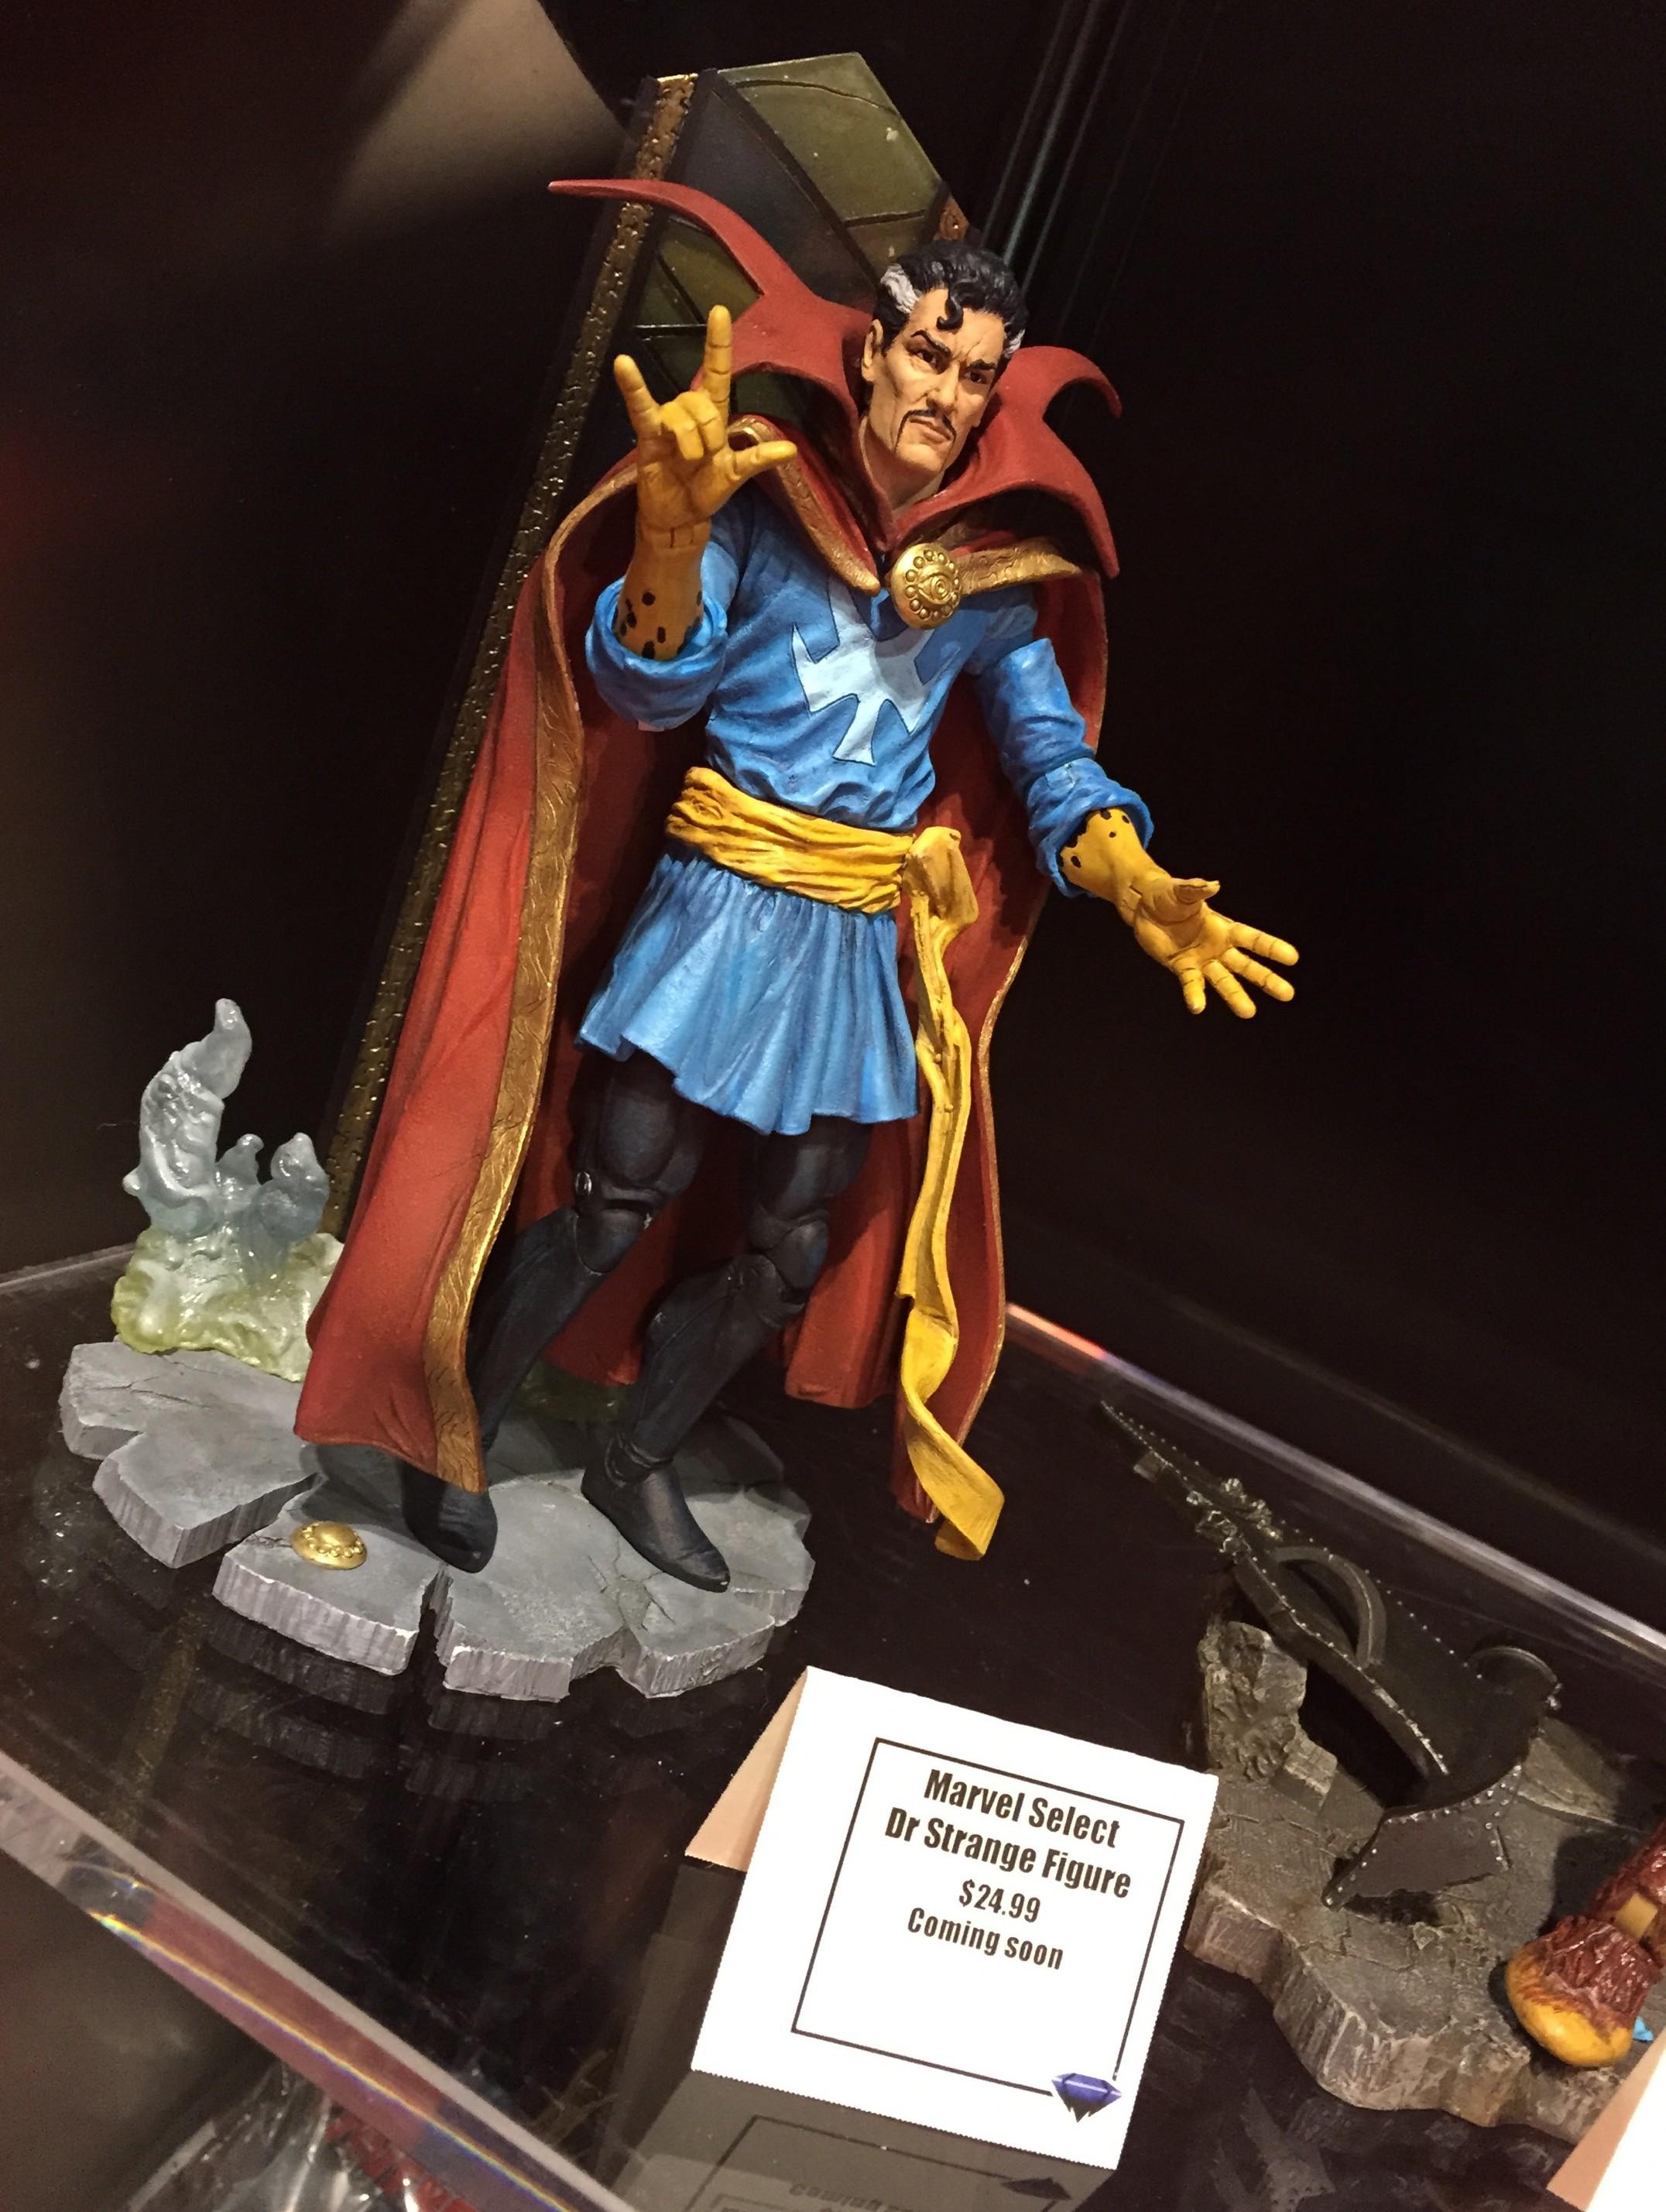 C2E2 2015 Photos: Diamond Select Toys Marvel Figures ...